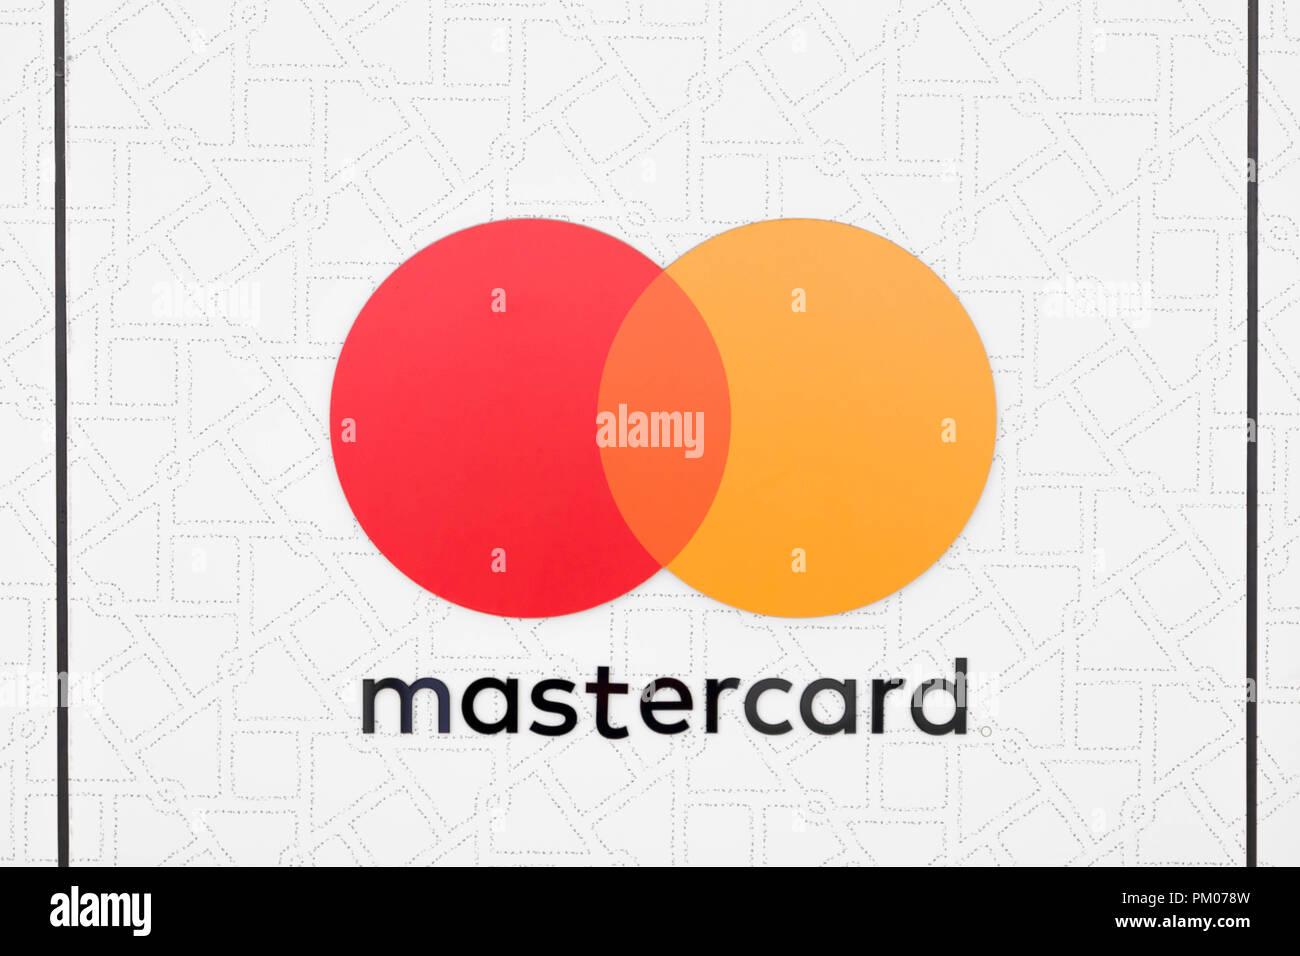 Mastercard Kreditkarte Visa Symbol logo Nahaufnahme Kreis orange